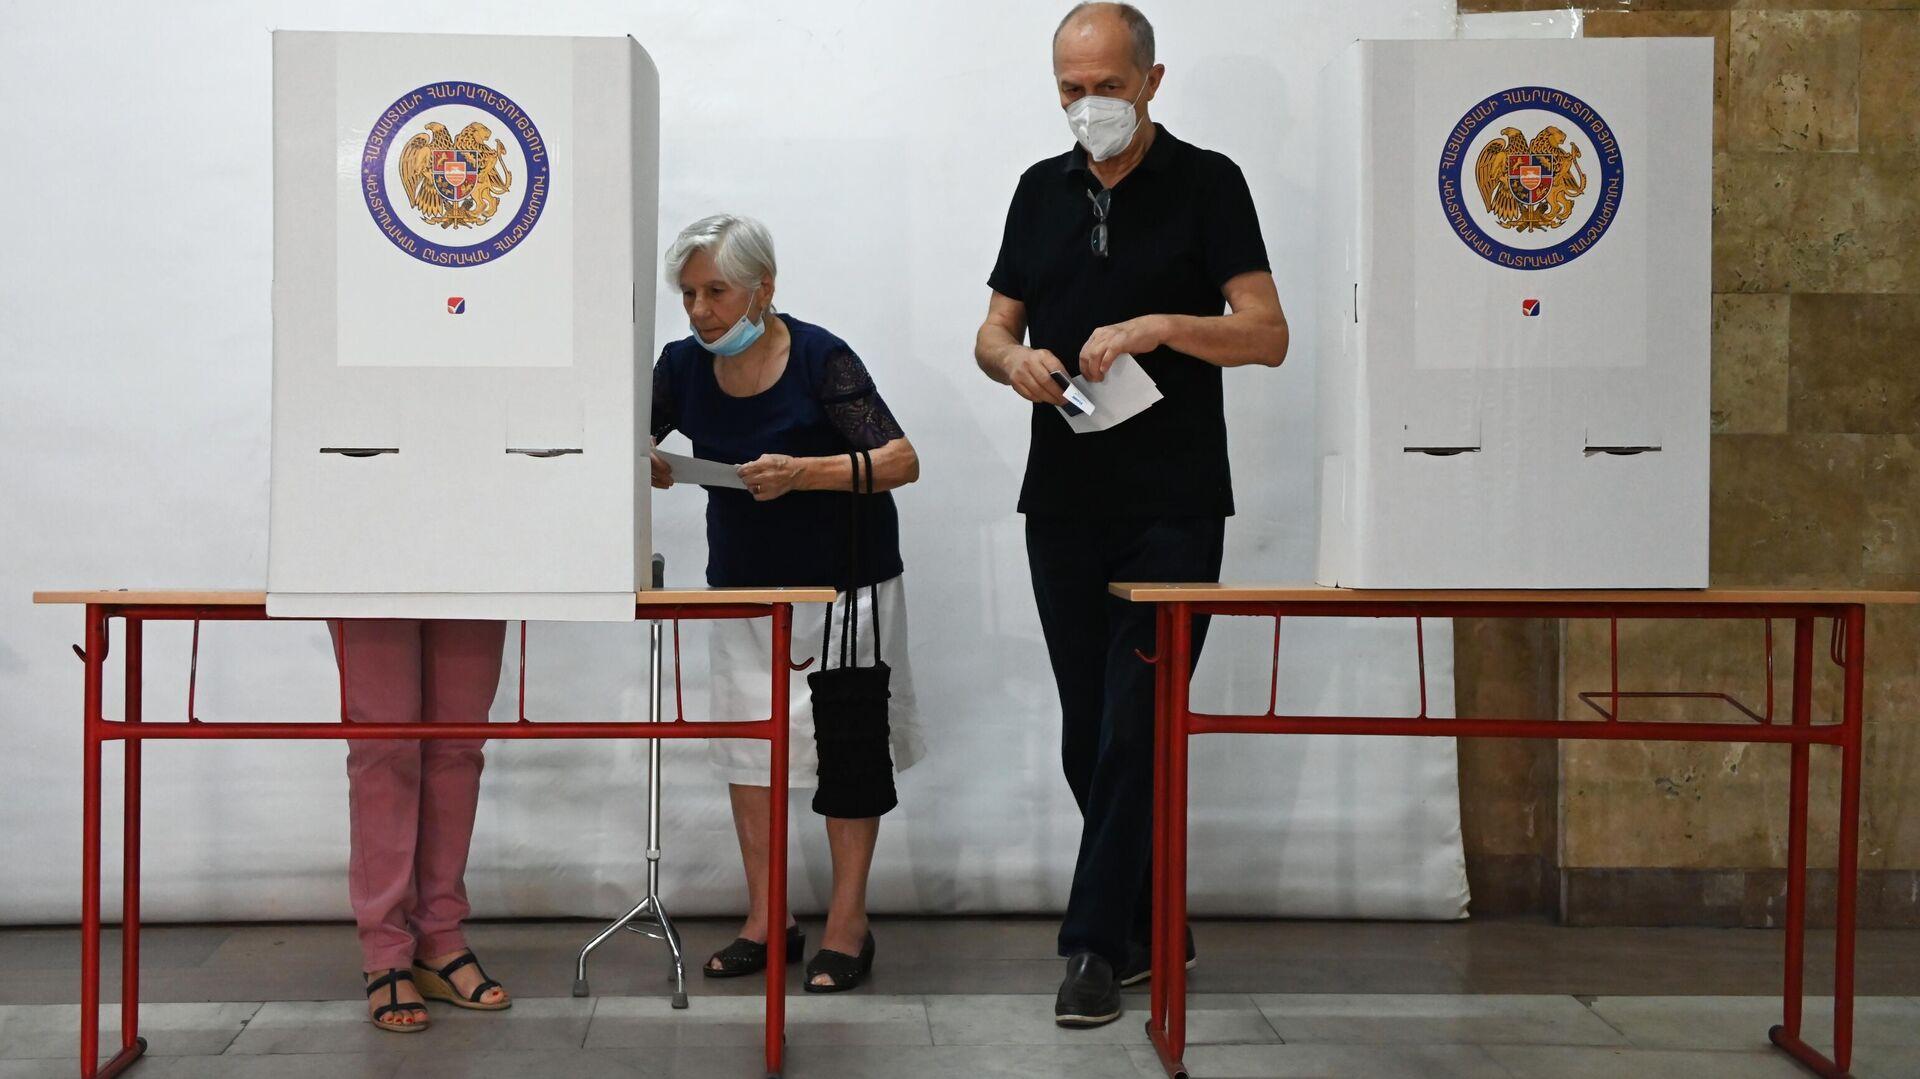 Le elezioni parlamentari in Armenia - Sputnik Italia, 1920, 20.06.2021